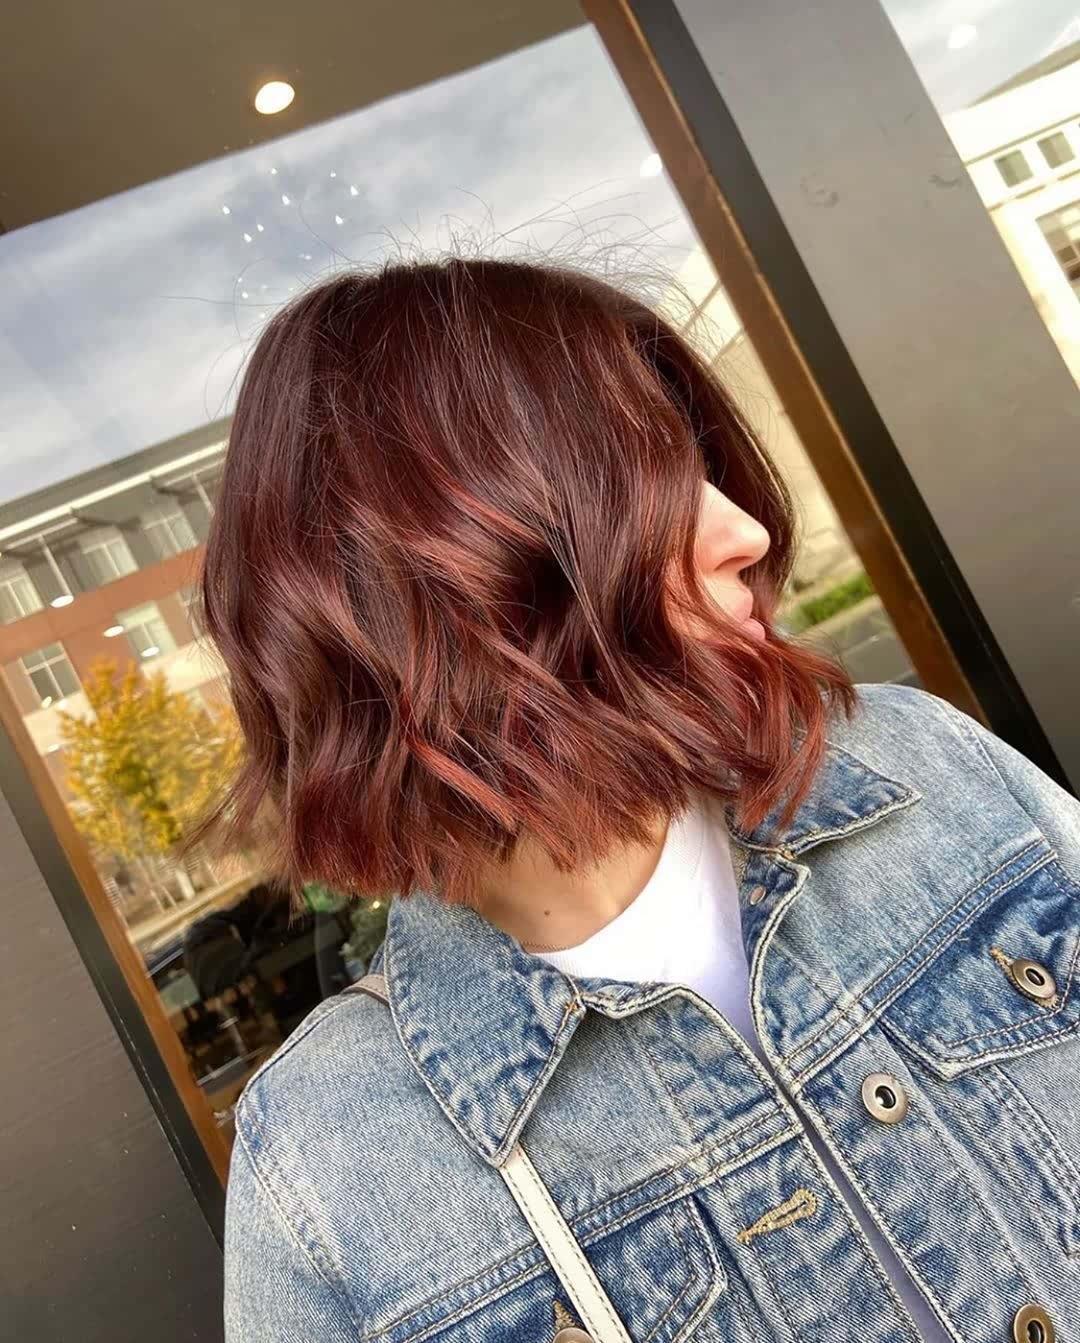 Hair Color Ideas for Bob Hairstyles (9)